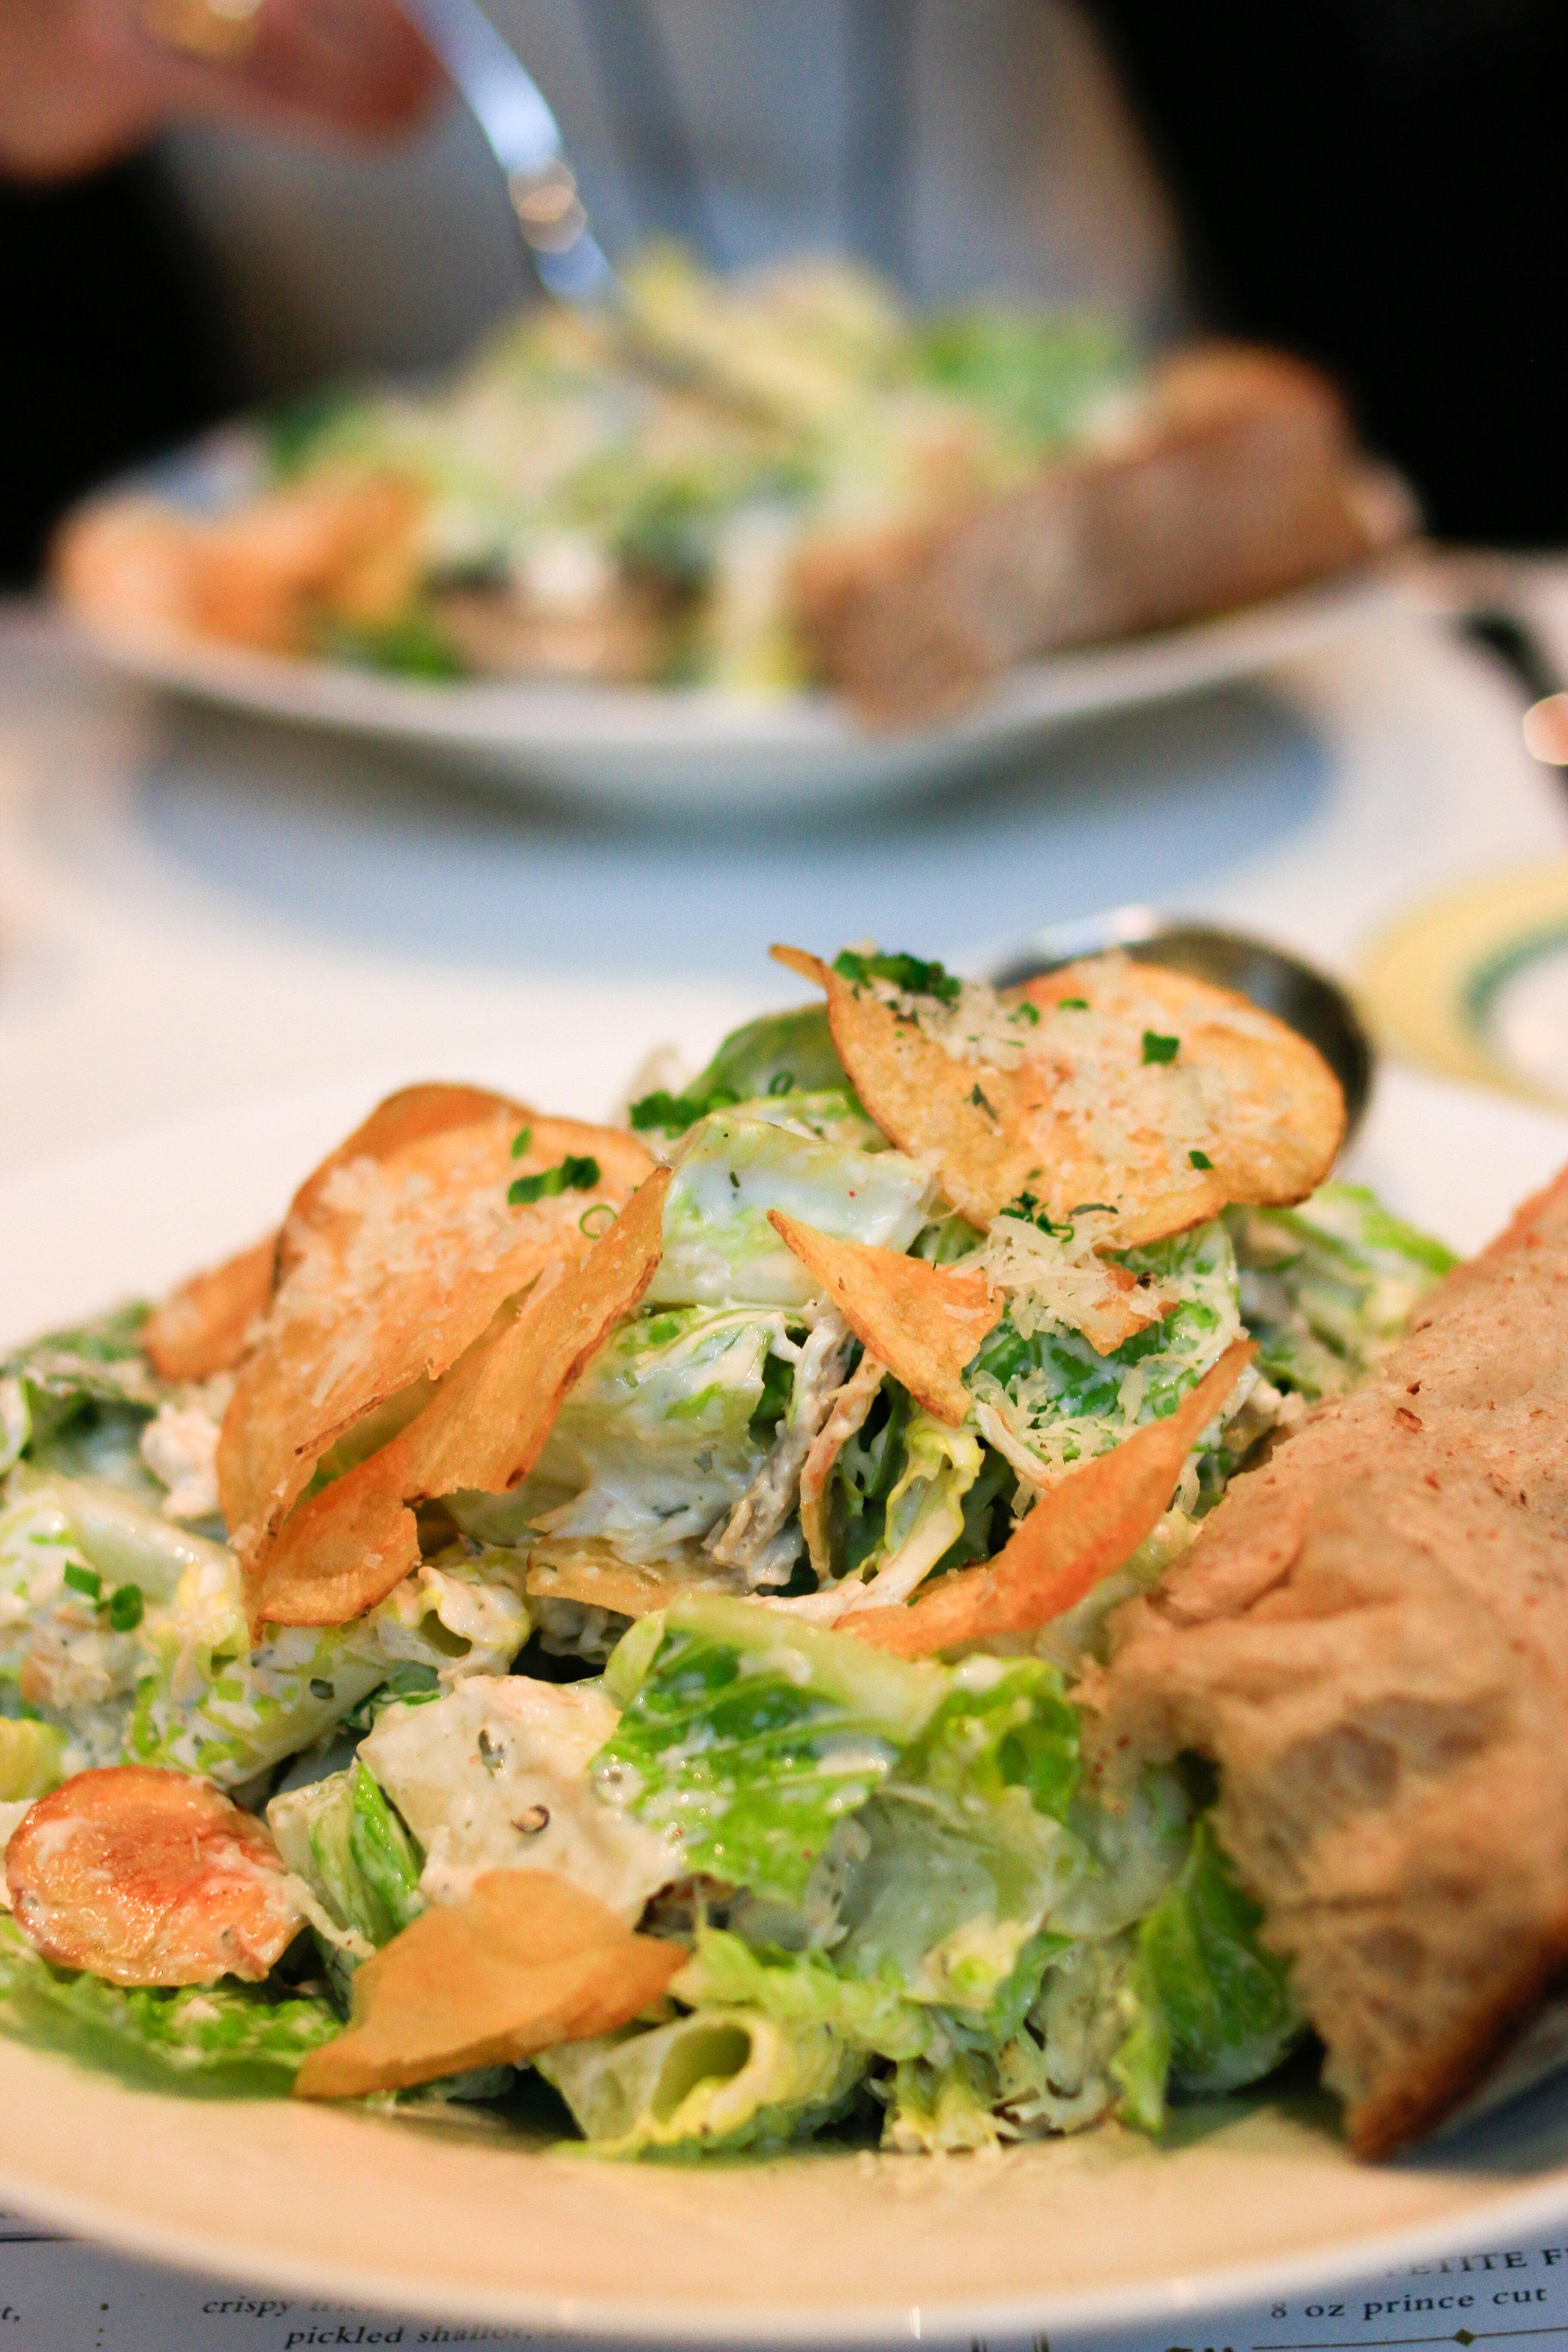 caesar salad from cochon volant